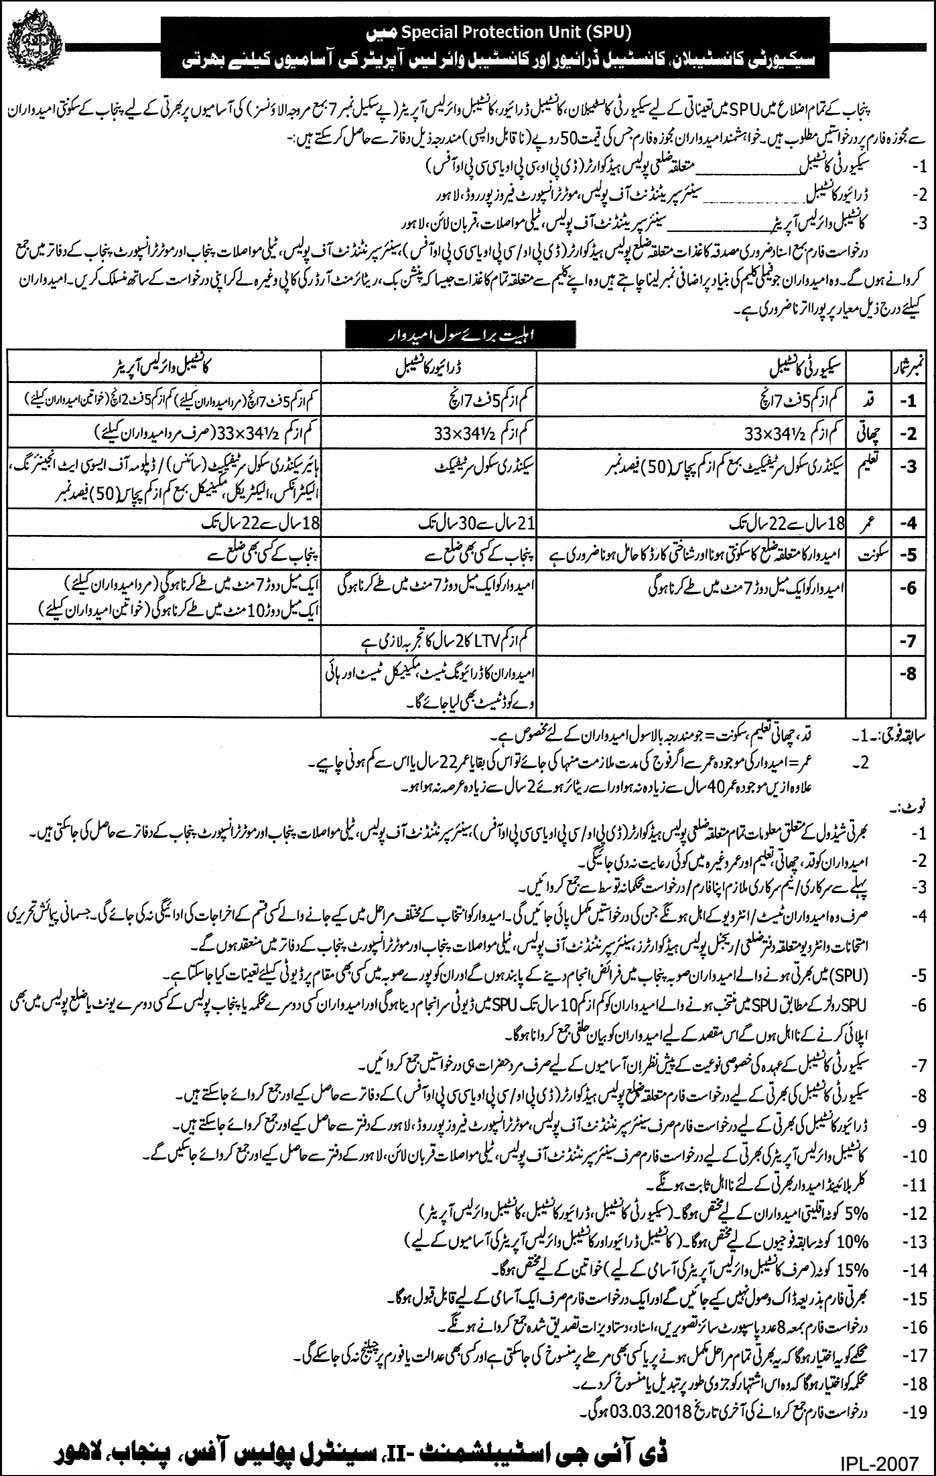 Punjab Police SPU Jobs 2018